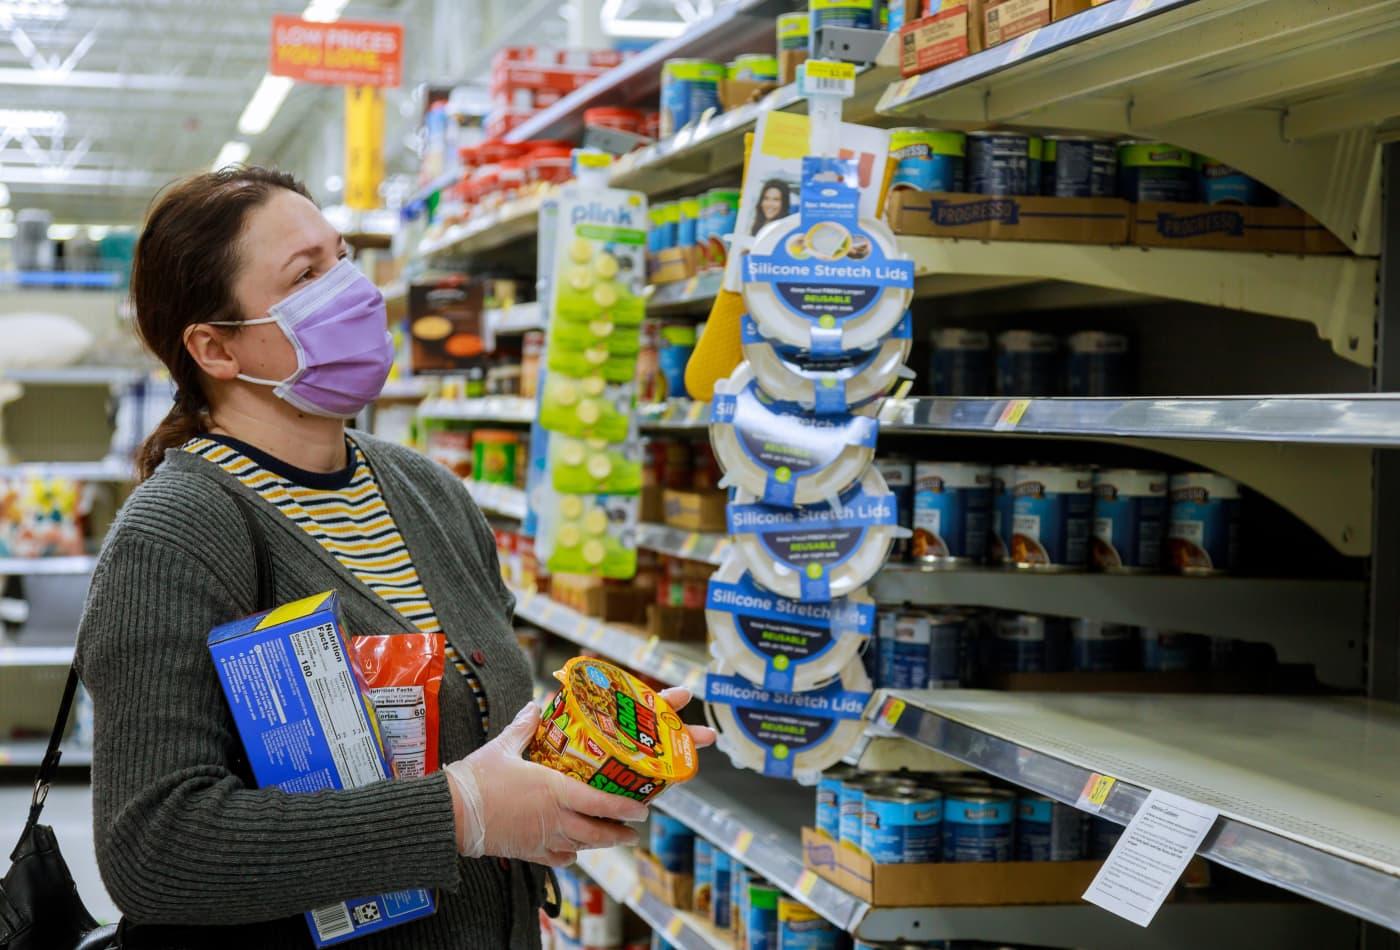 https://image.cnbcfm.com/api/v1/image/106617865-1594841919988walmart-supermarket-los-angeles-ca-us-16-may-2020-shopping-during-coronavirus-covid-19-pandemic-empty_t20_o0olkg.jpg?v=1594842026&w=1400&h=950